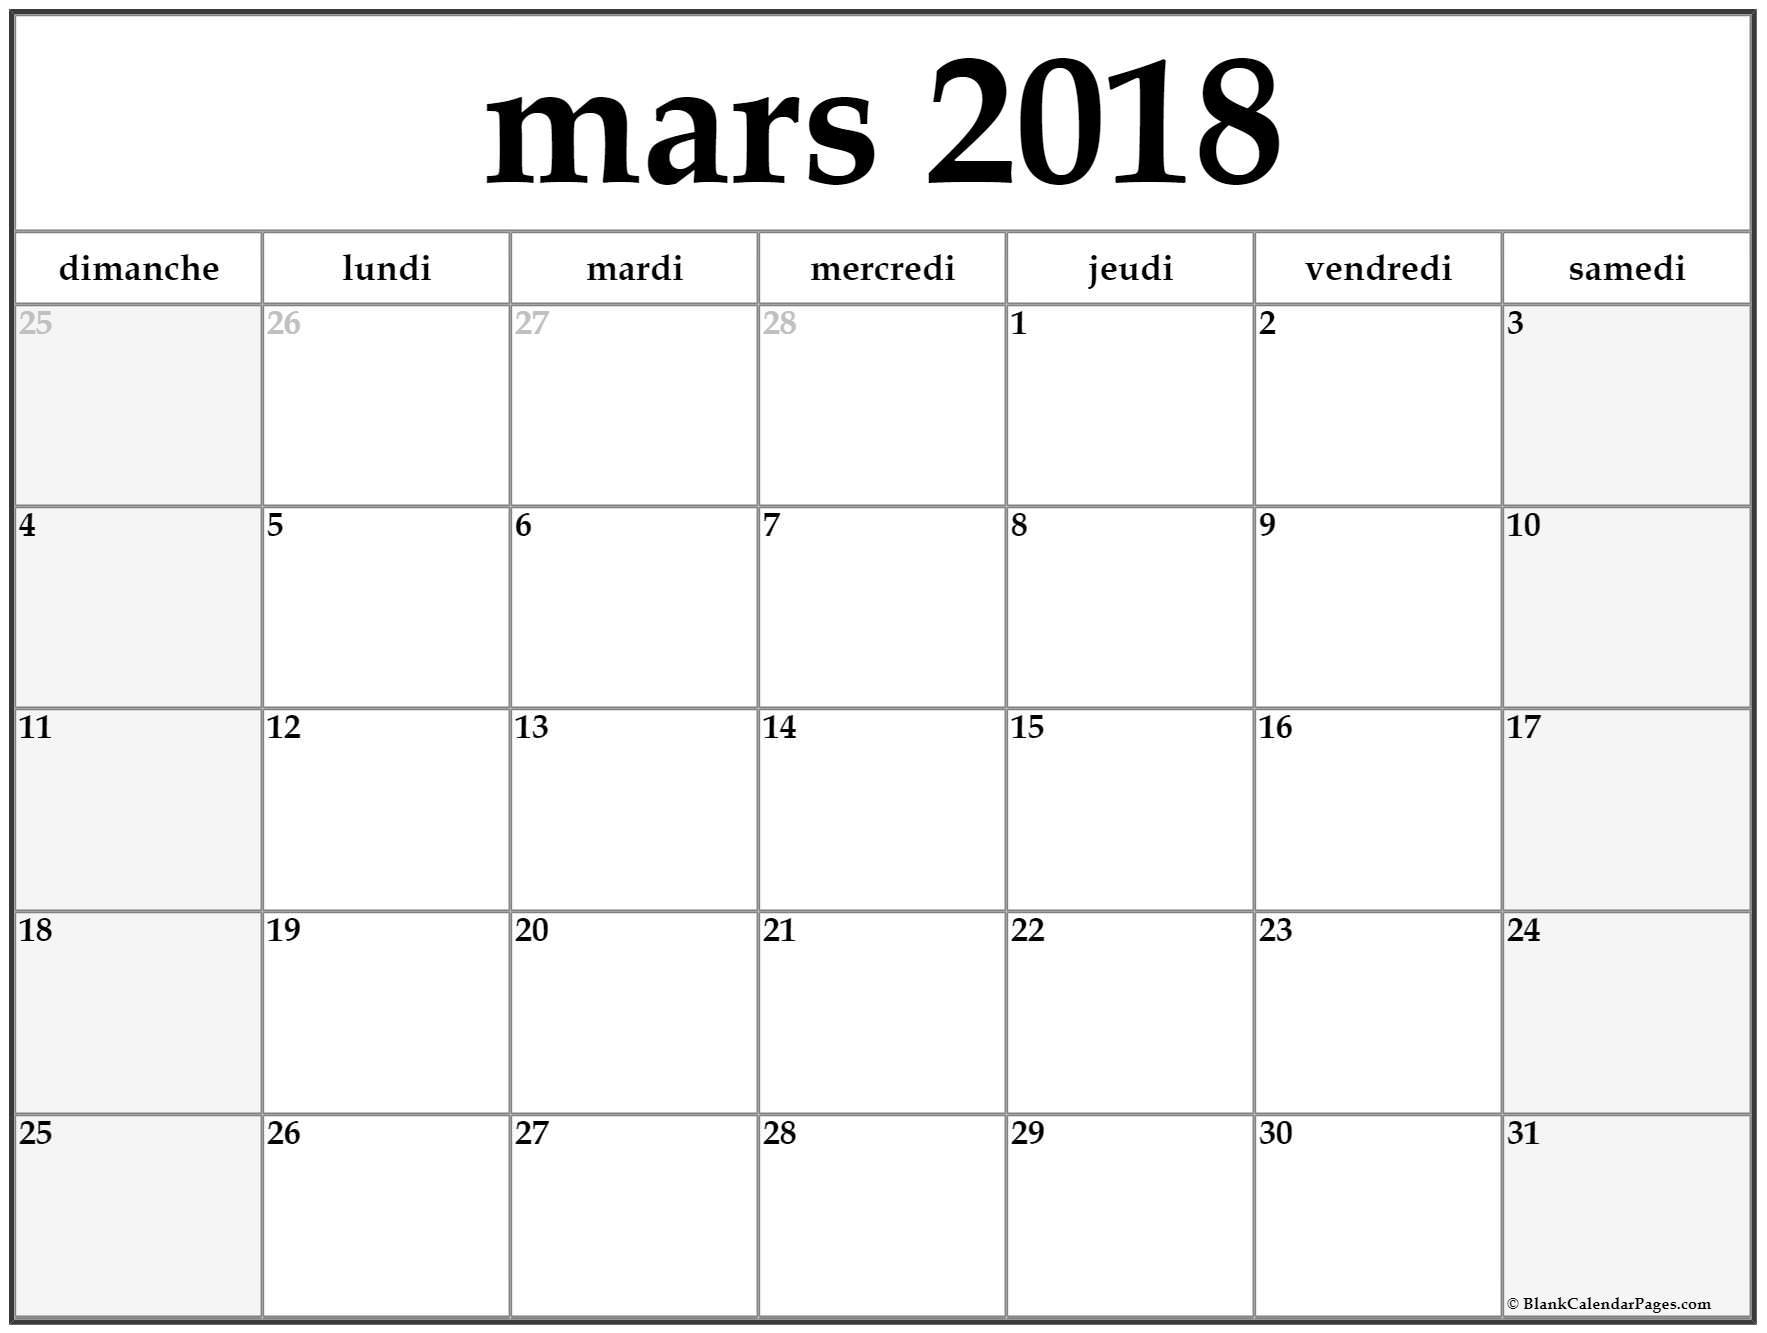 Mars 2018 Calendrier Imprimable | Calendrier Gratuit serapportantà Calendrier Mars 2018 À Imprimer